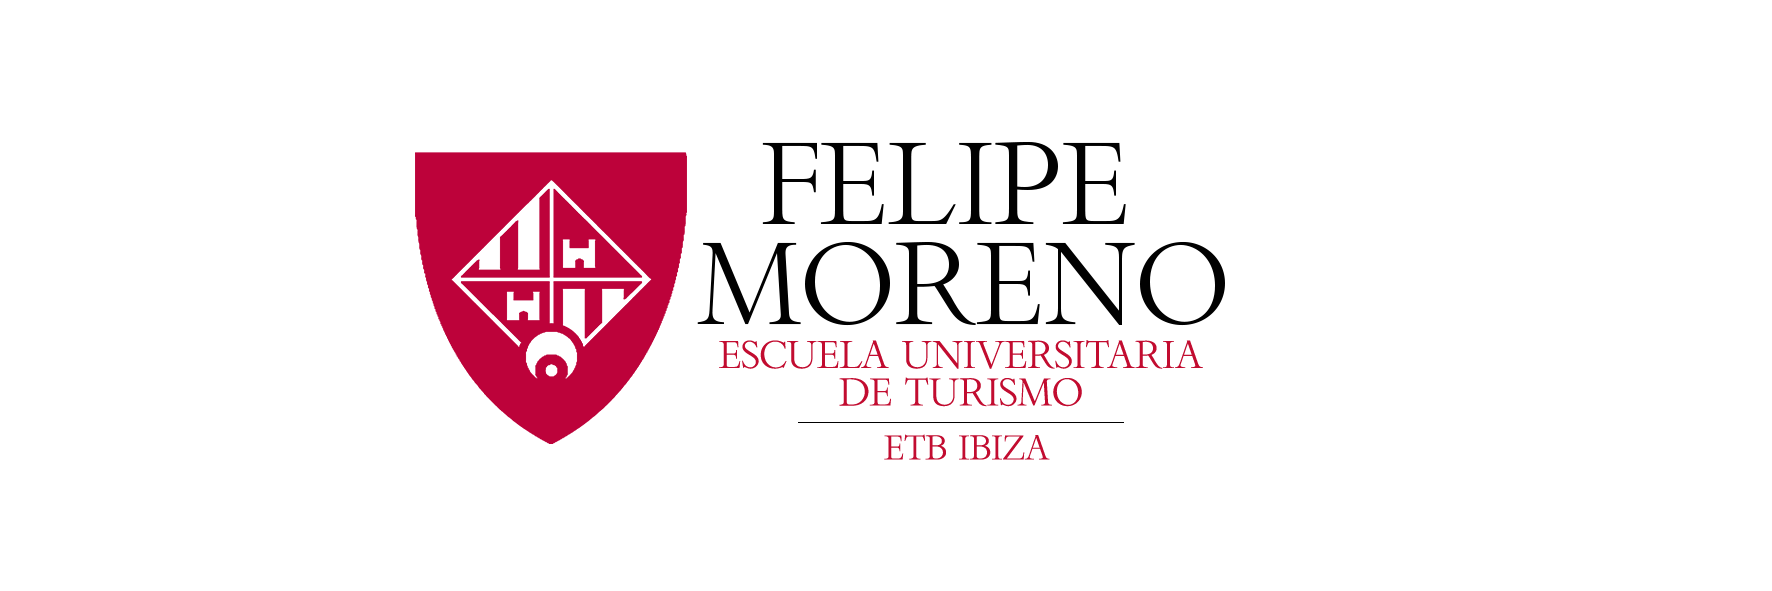 Escuela de Turismo Baleares